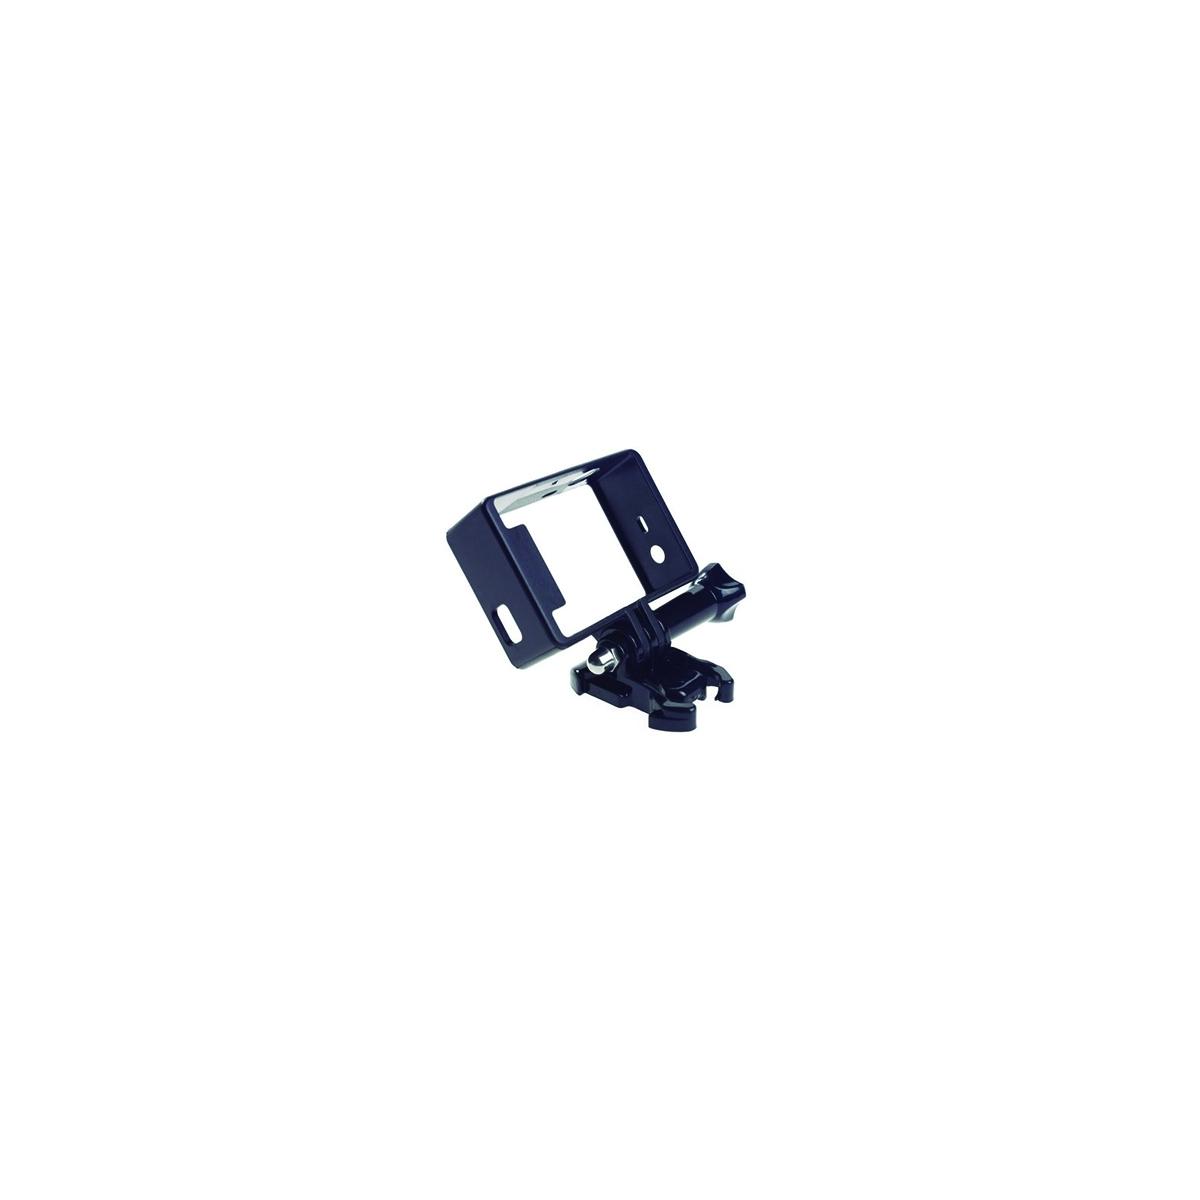 The Frame GoPro Hero 4 Black Hero 4 Silver Hero 3+ Hero 3 ANDFR-302